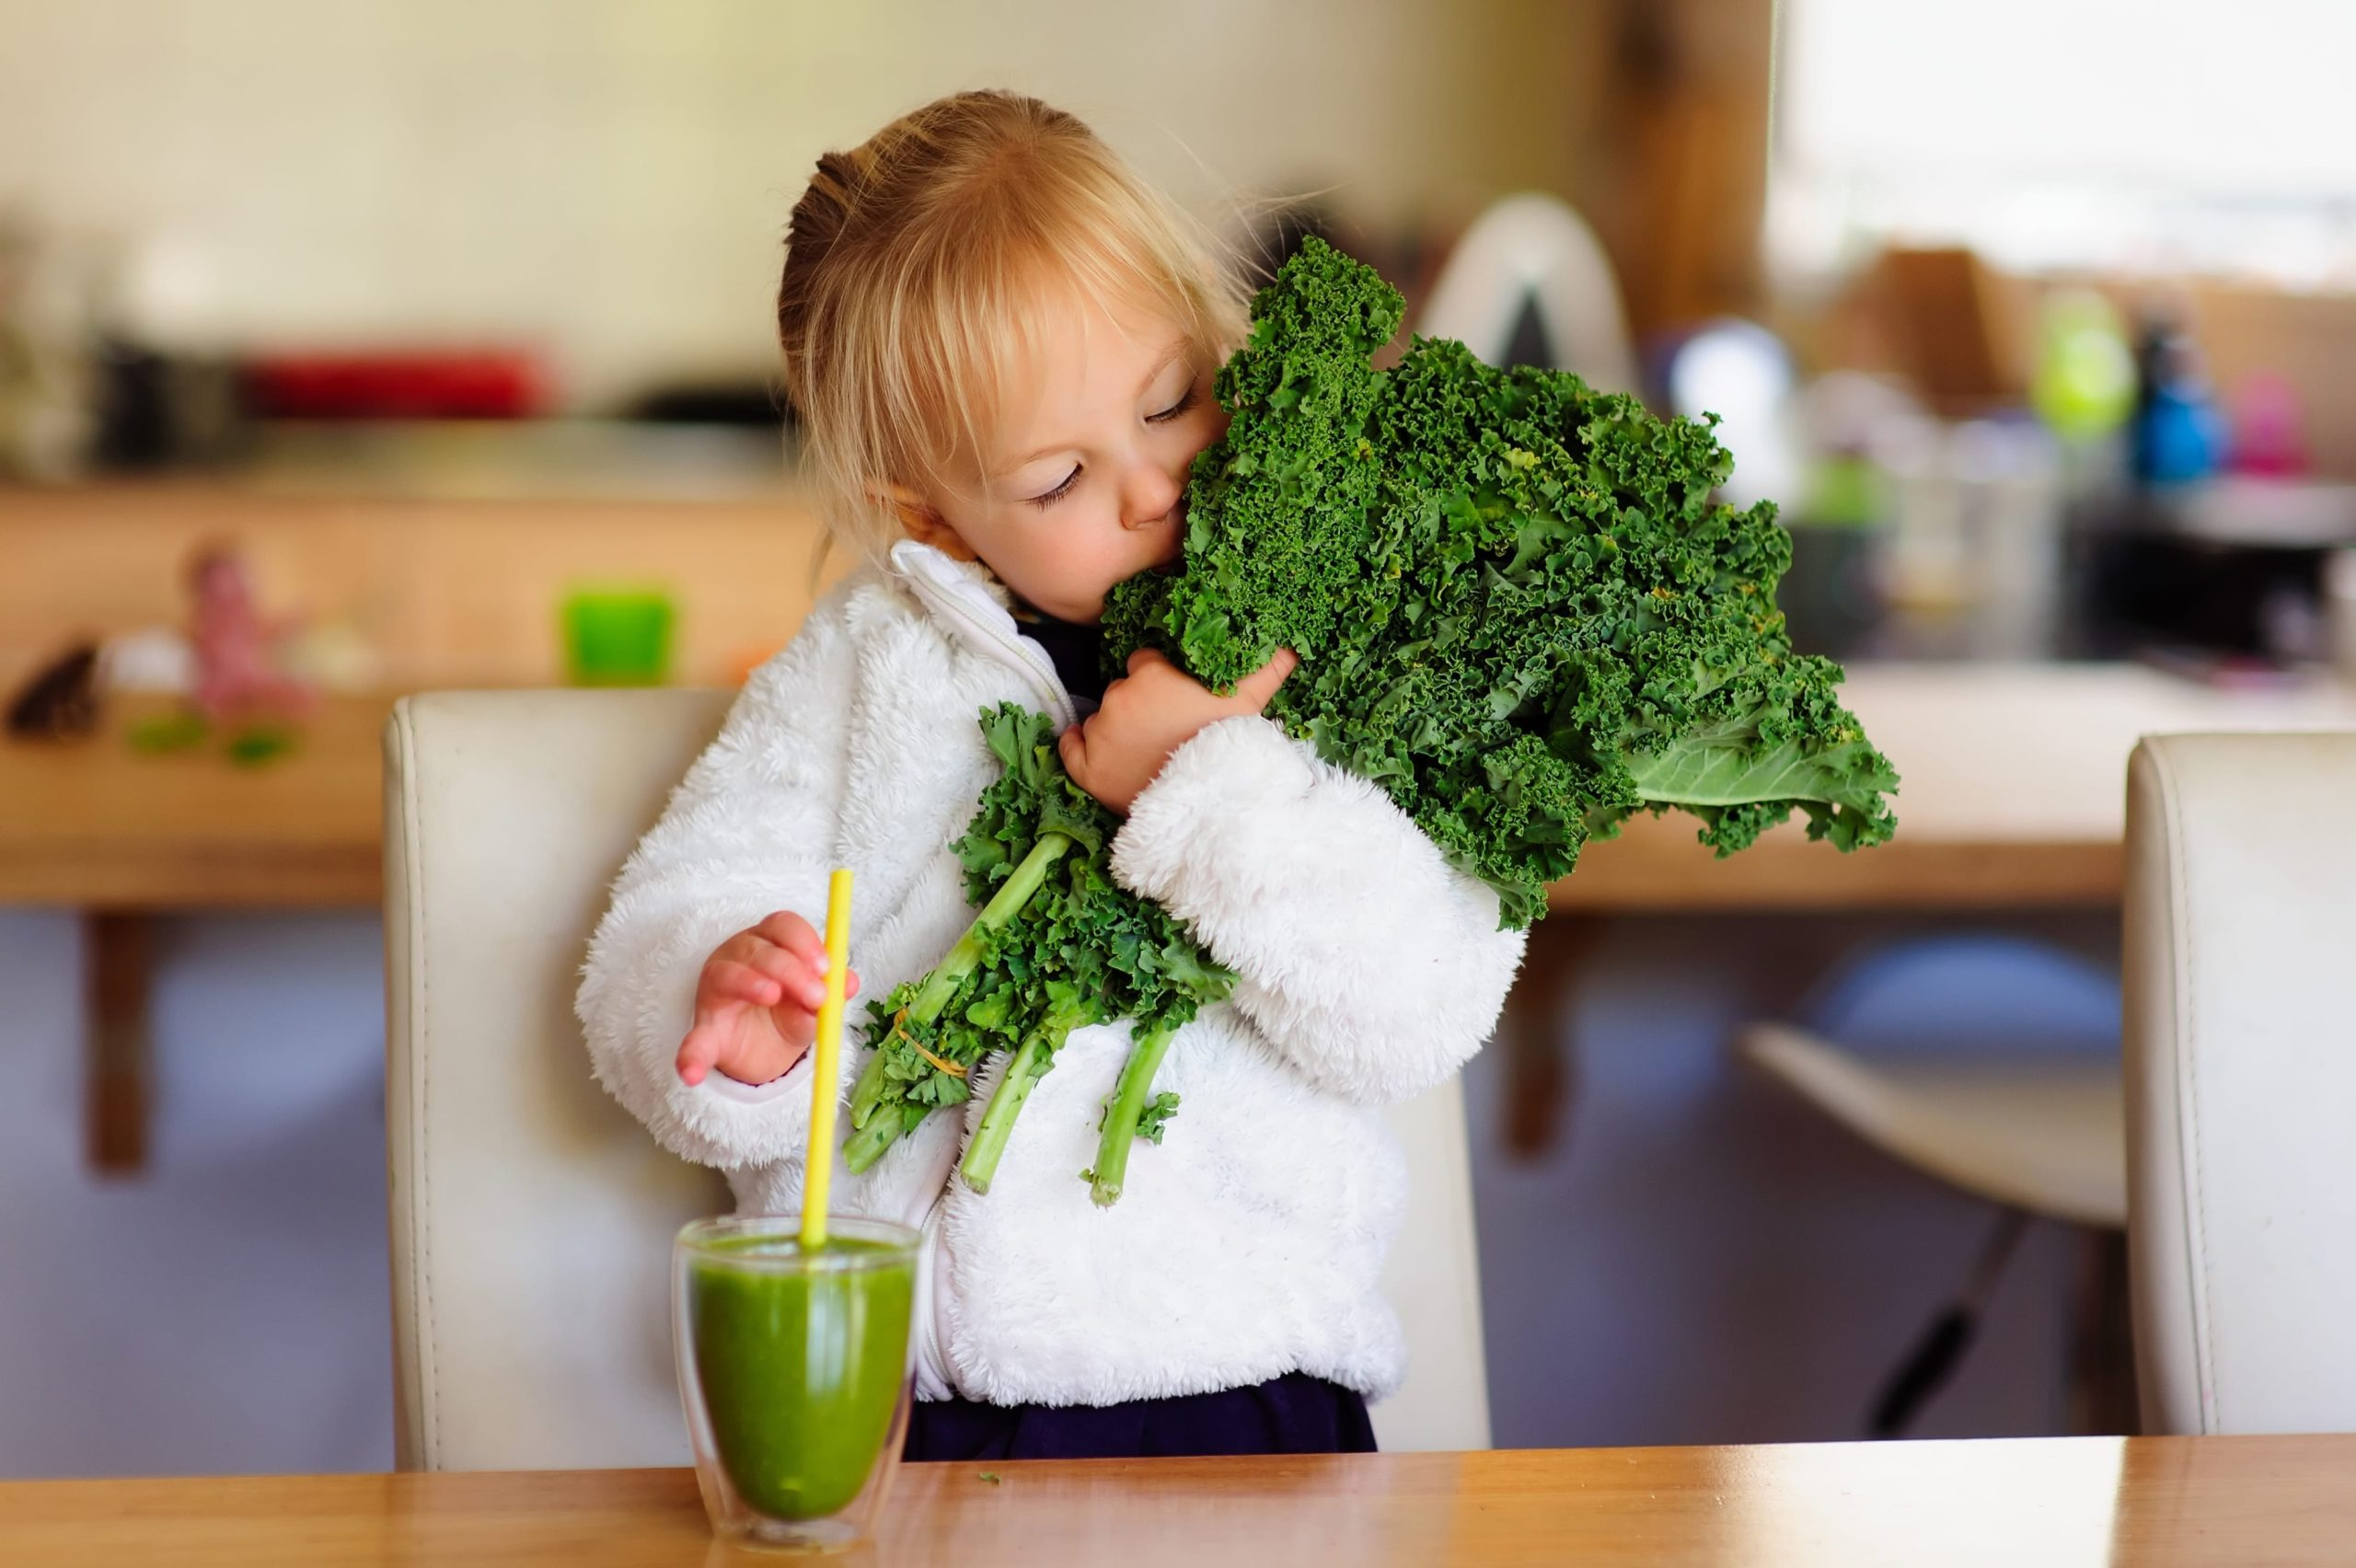 alimentación-infantil-ecológica